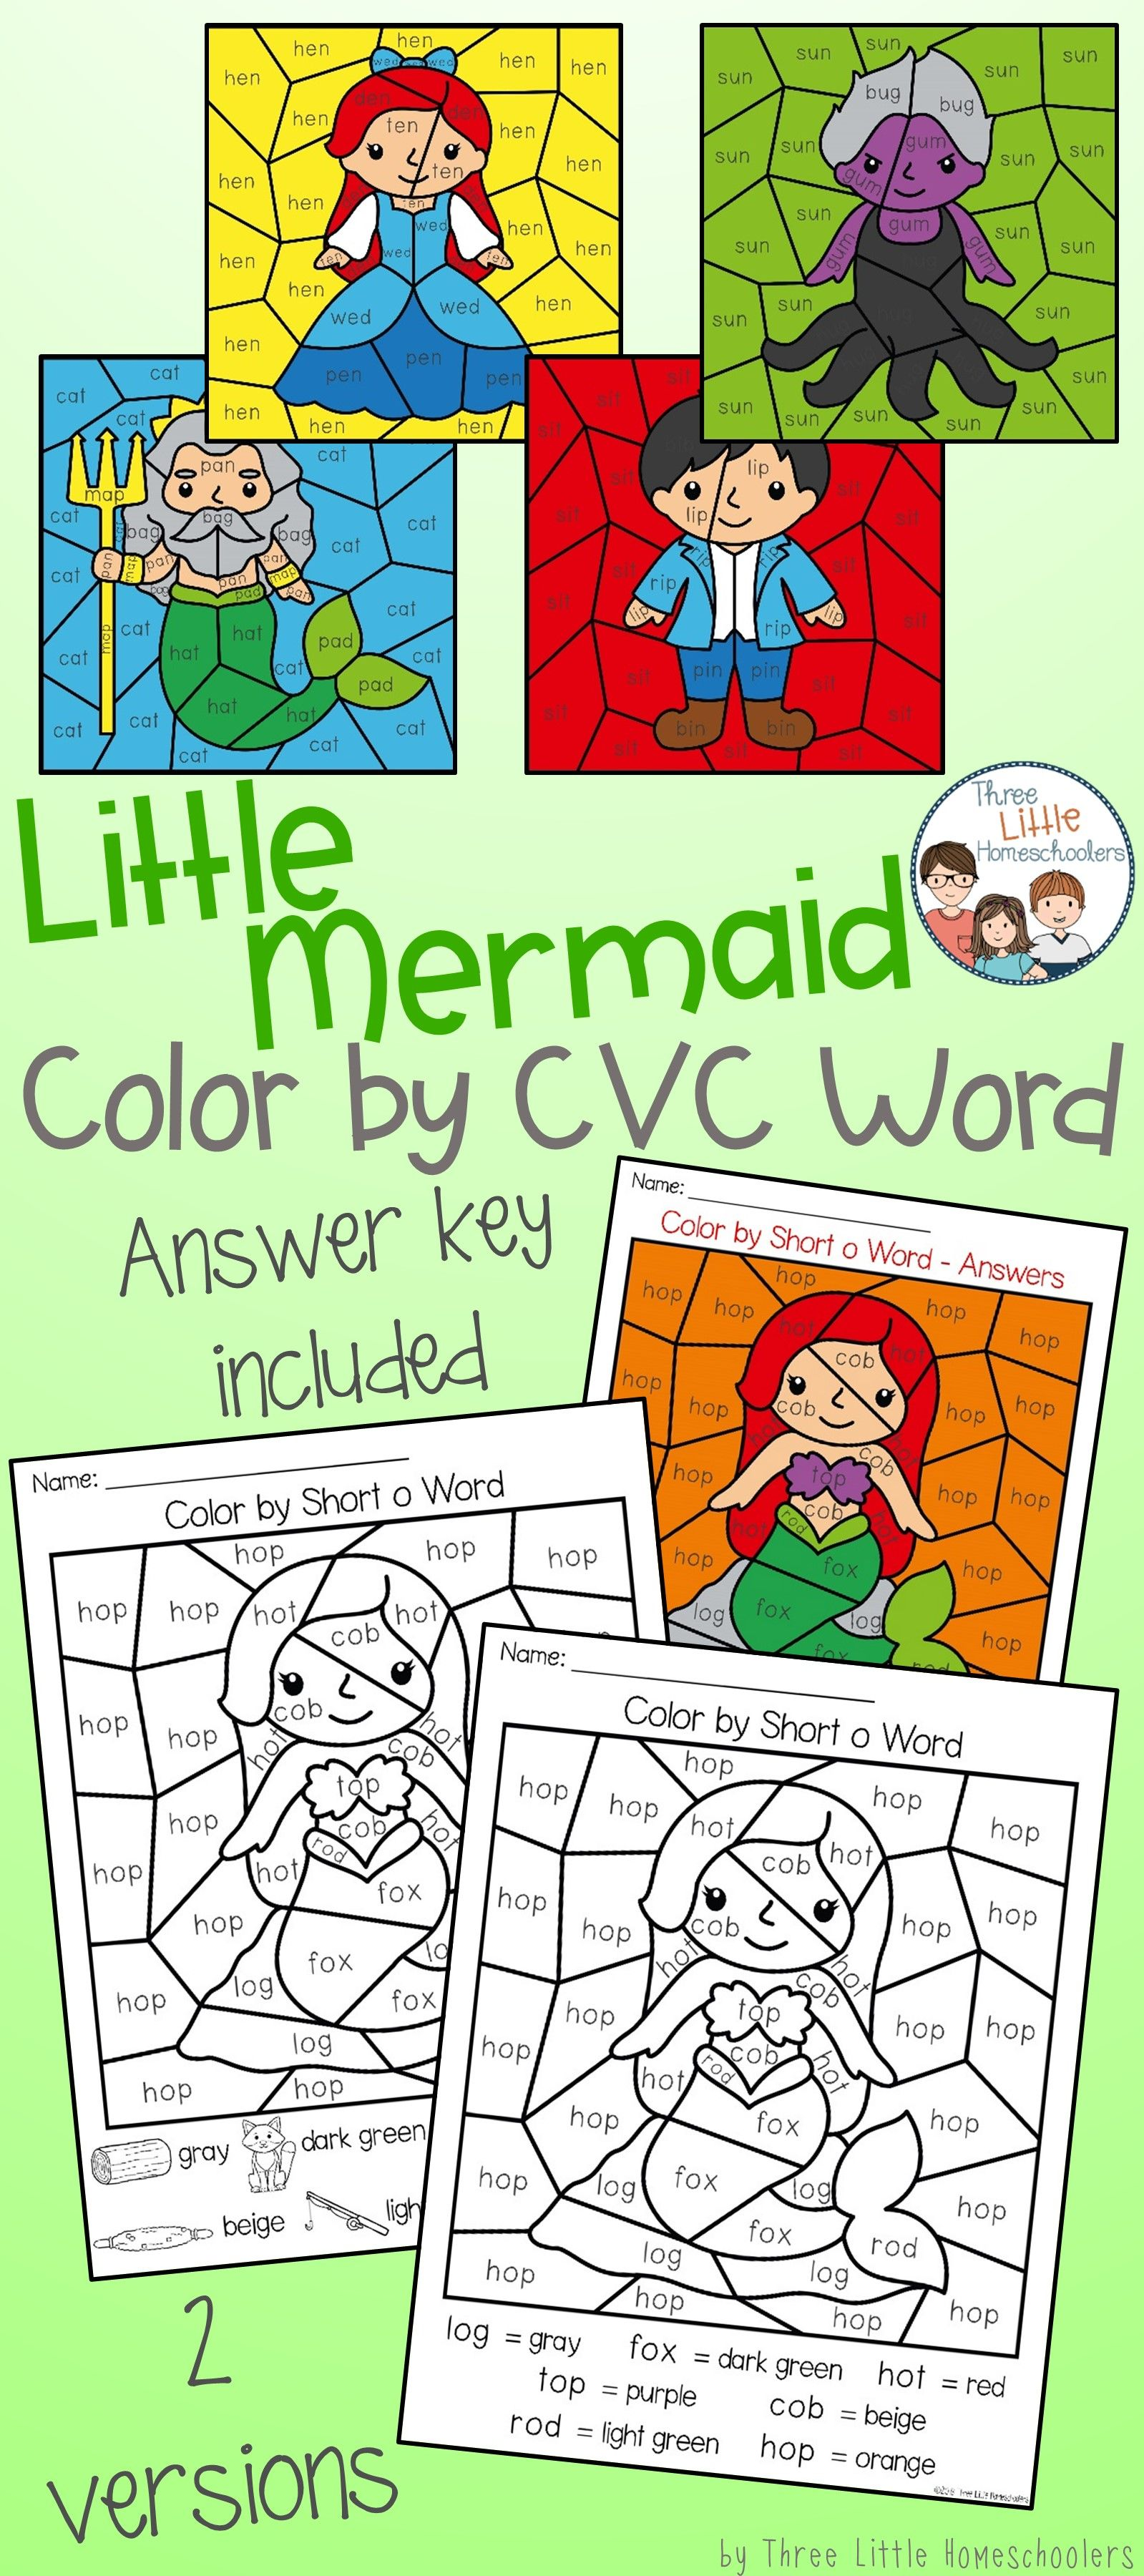 Little Mermaid Color By Cvc Word